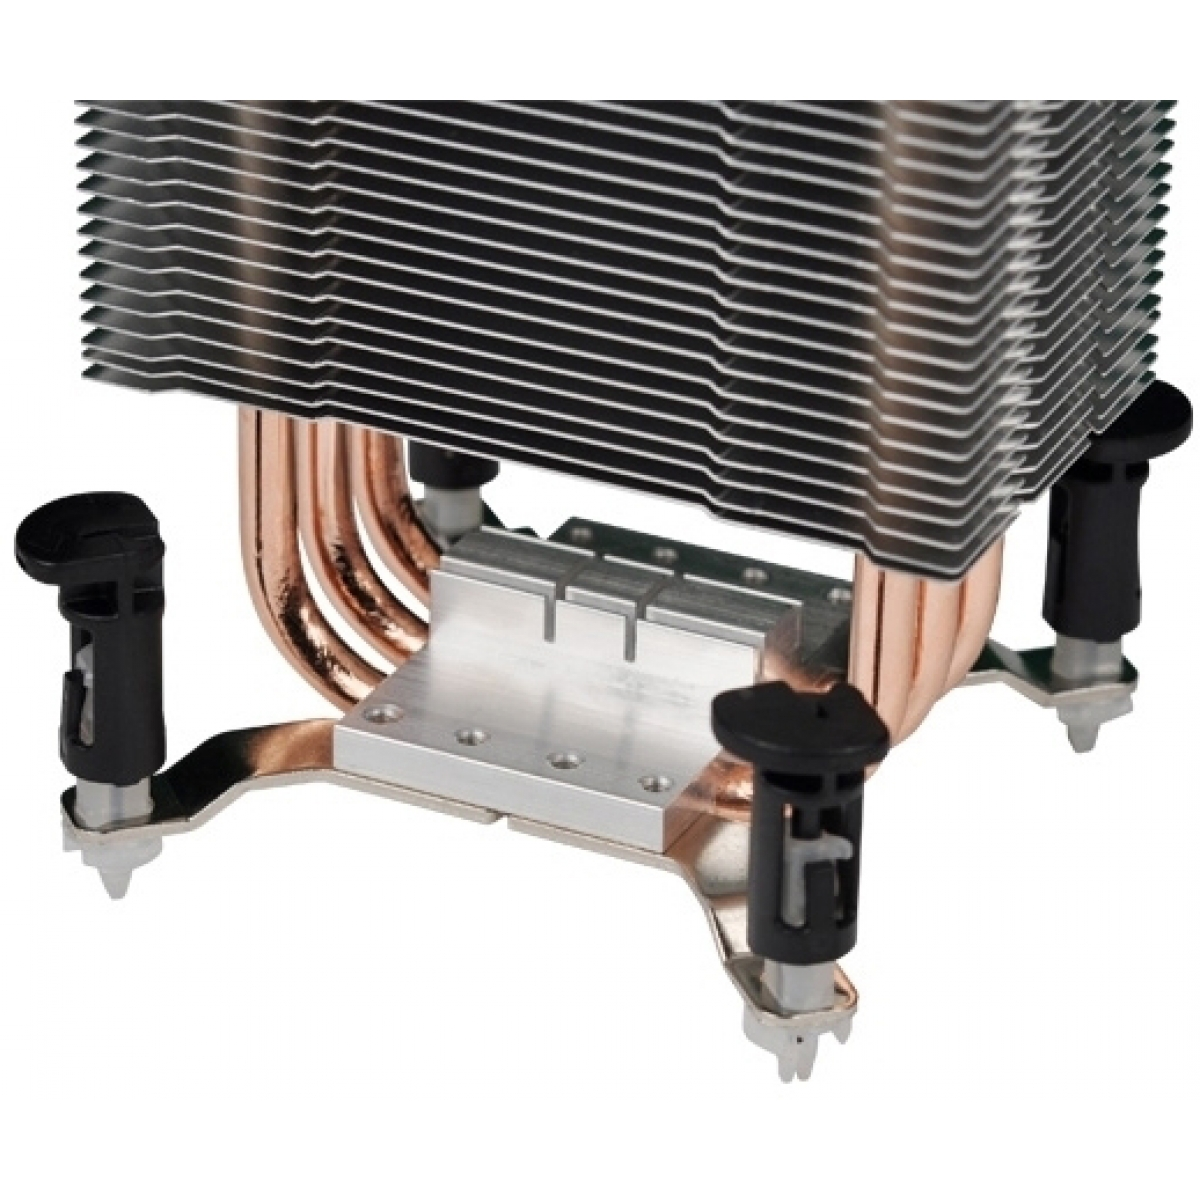 Cooler para Processador Cooler Master Hyper TX3, 92mm, Intel-AMD, RR-910-HTX3-G1